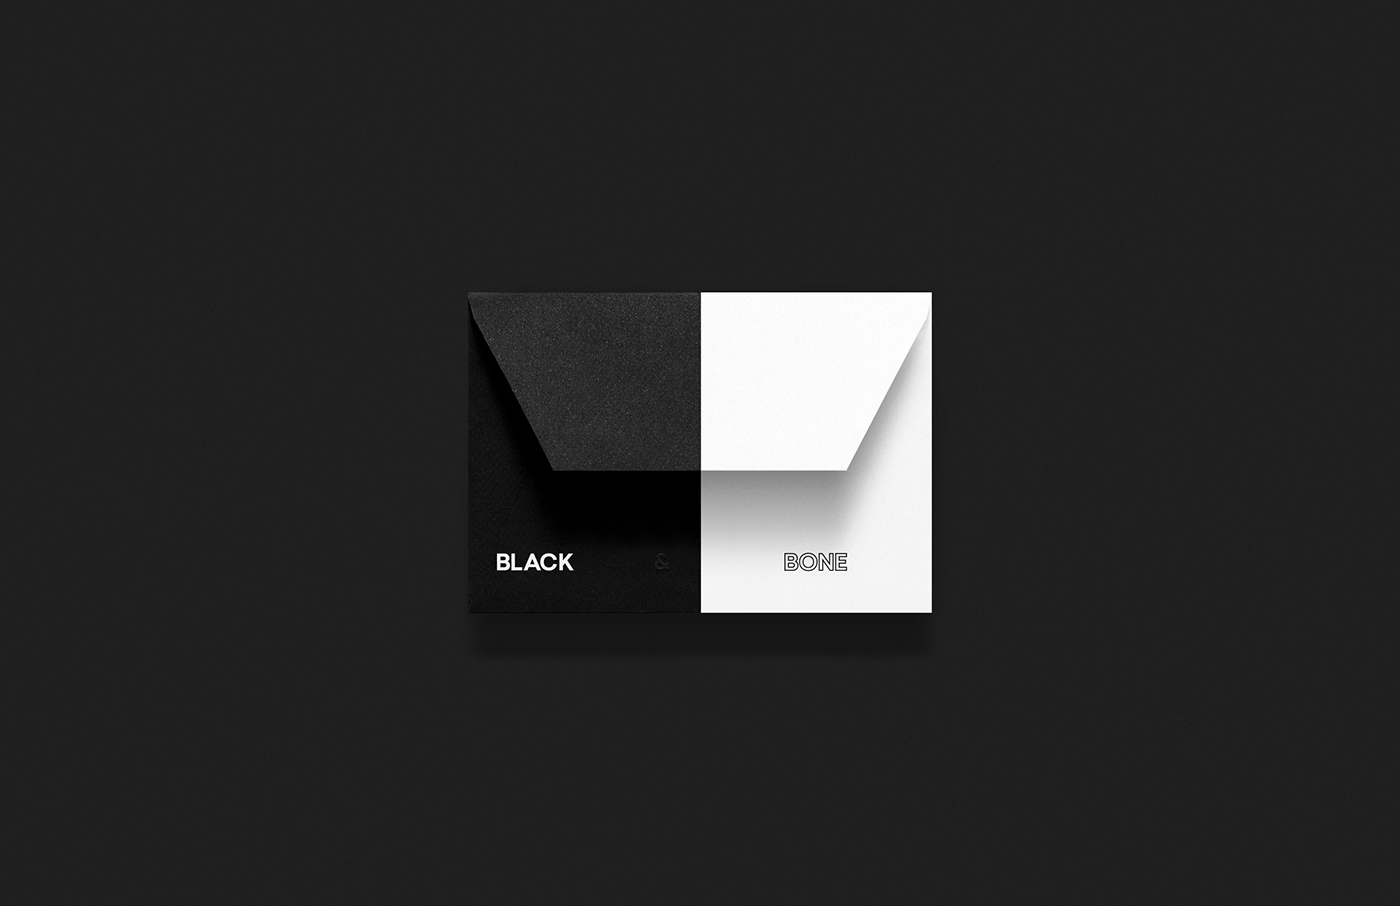 Black & Bone女装品牌设计 欣赏-第12张